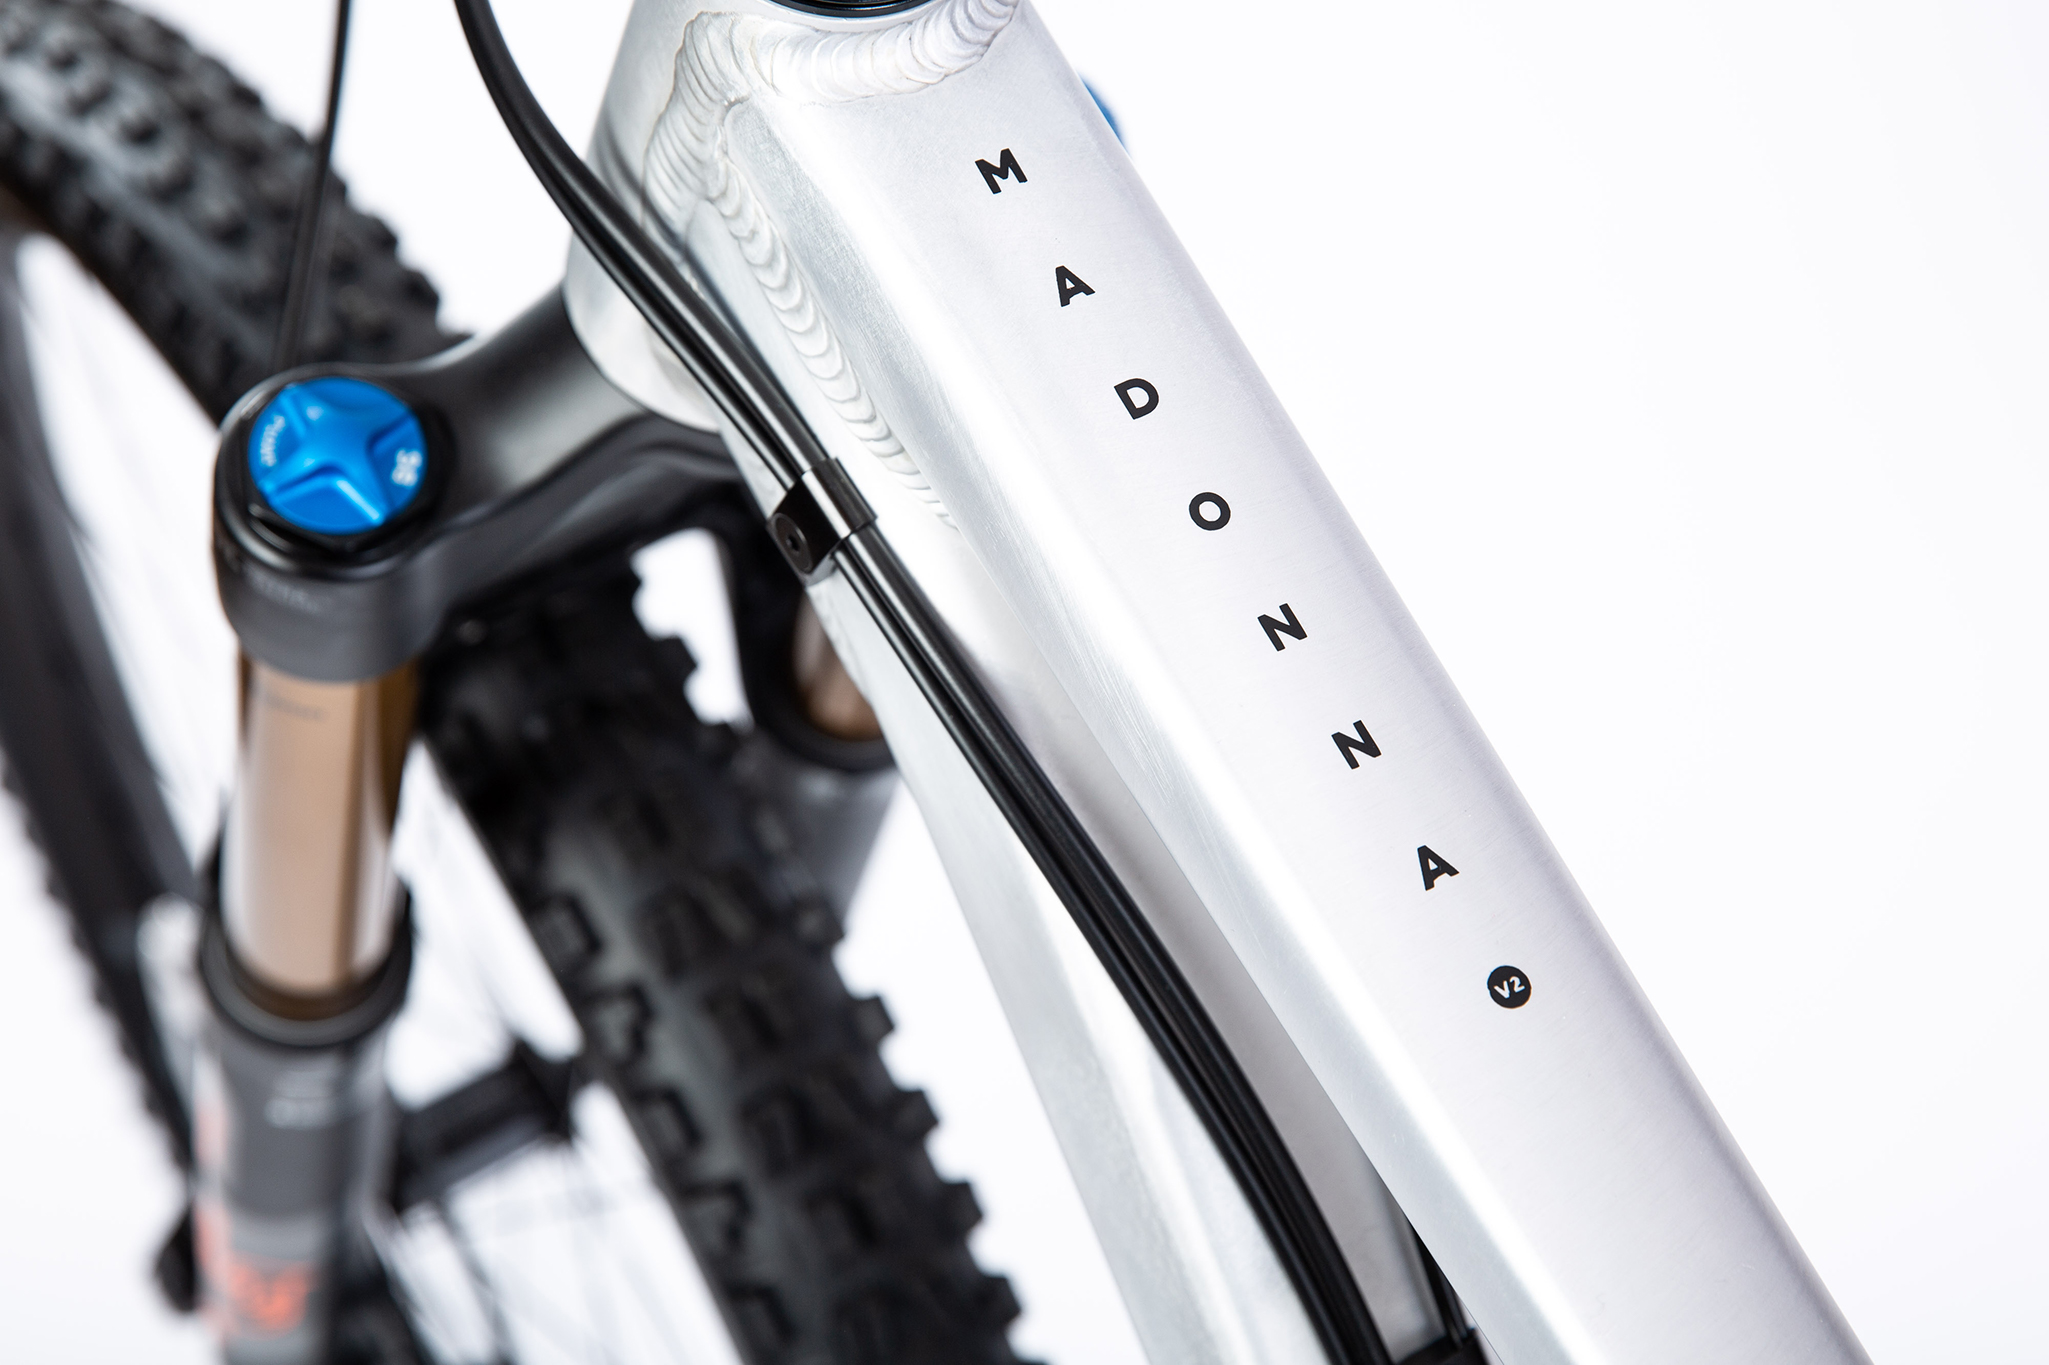 RAAW Madonna V2 19 Cycleholix